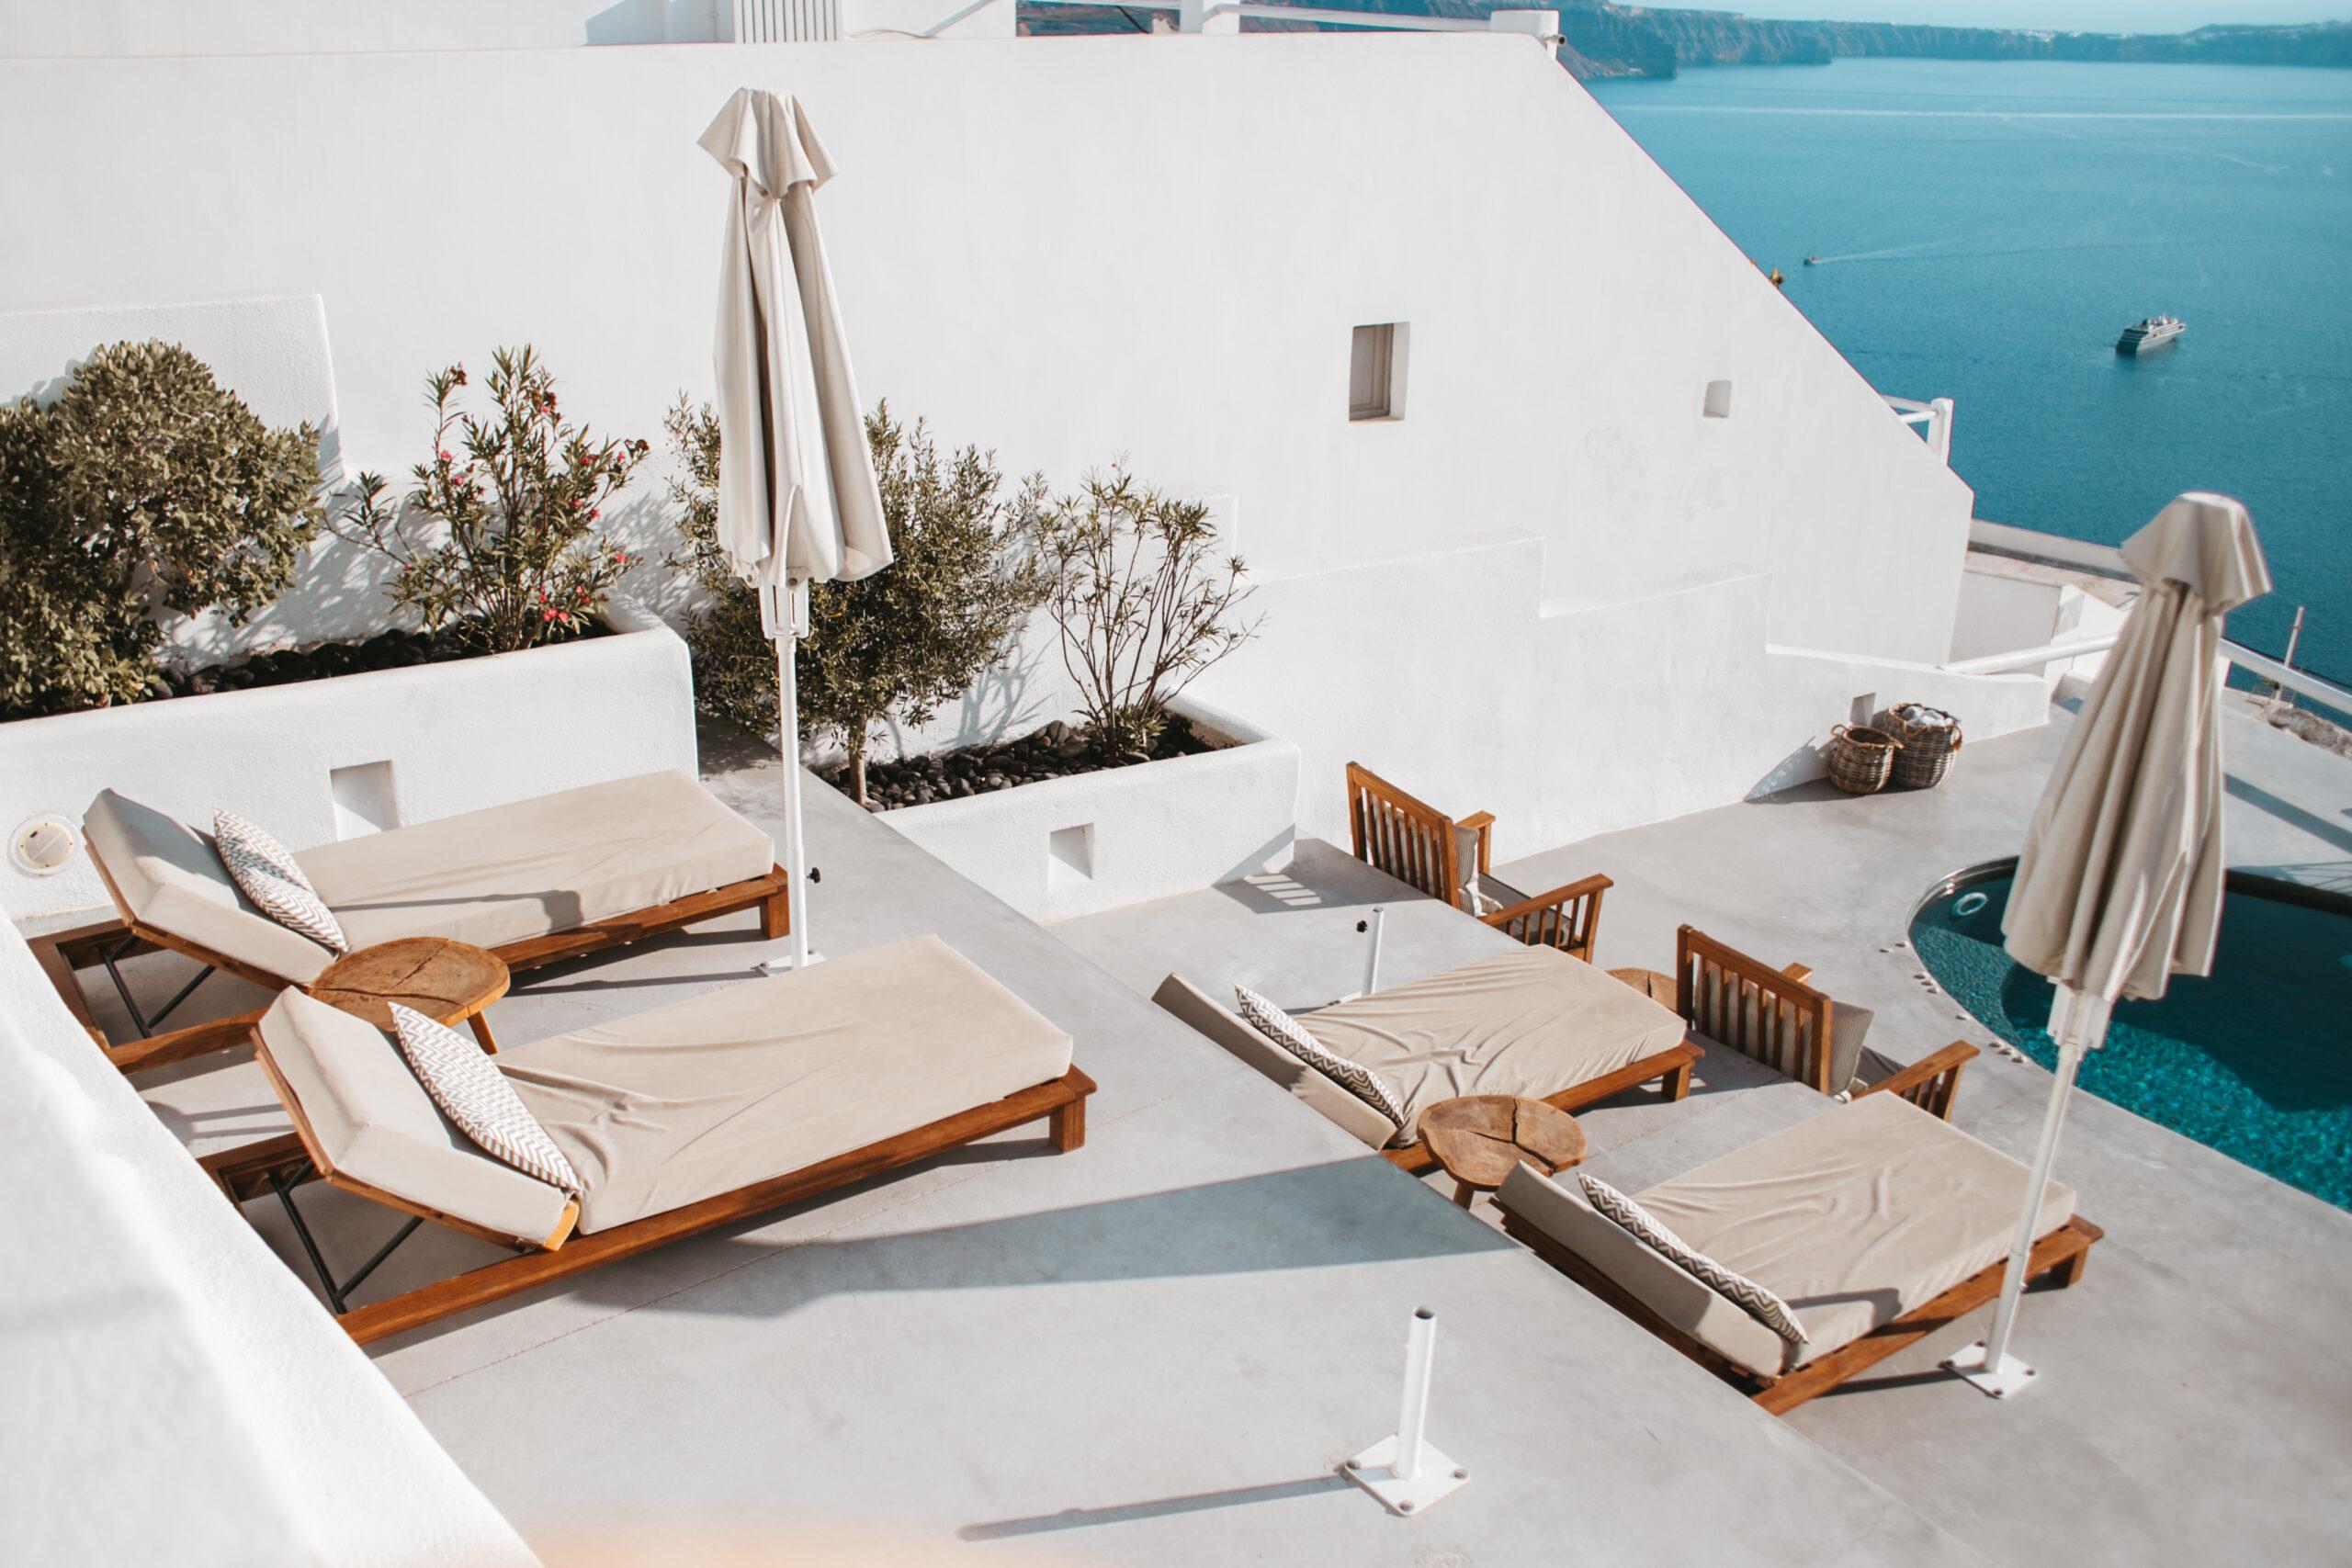 Santorini Imerovigli hotel z widokiem na kalderę, design, apartment, dizajnerski apartament Santorini, basen, leżaki, caldera, widok na kalderę